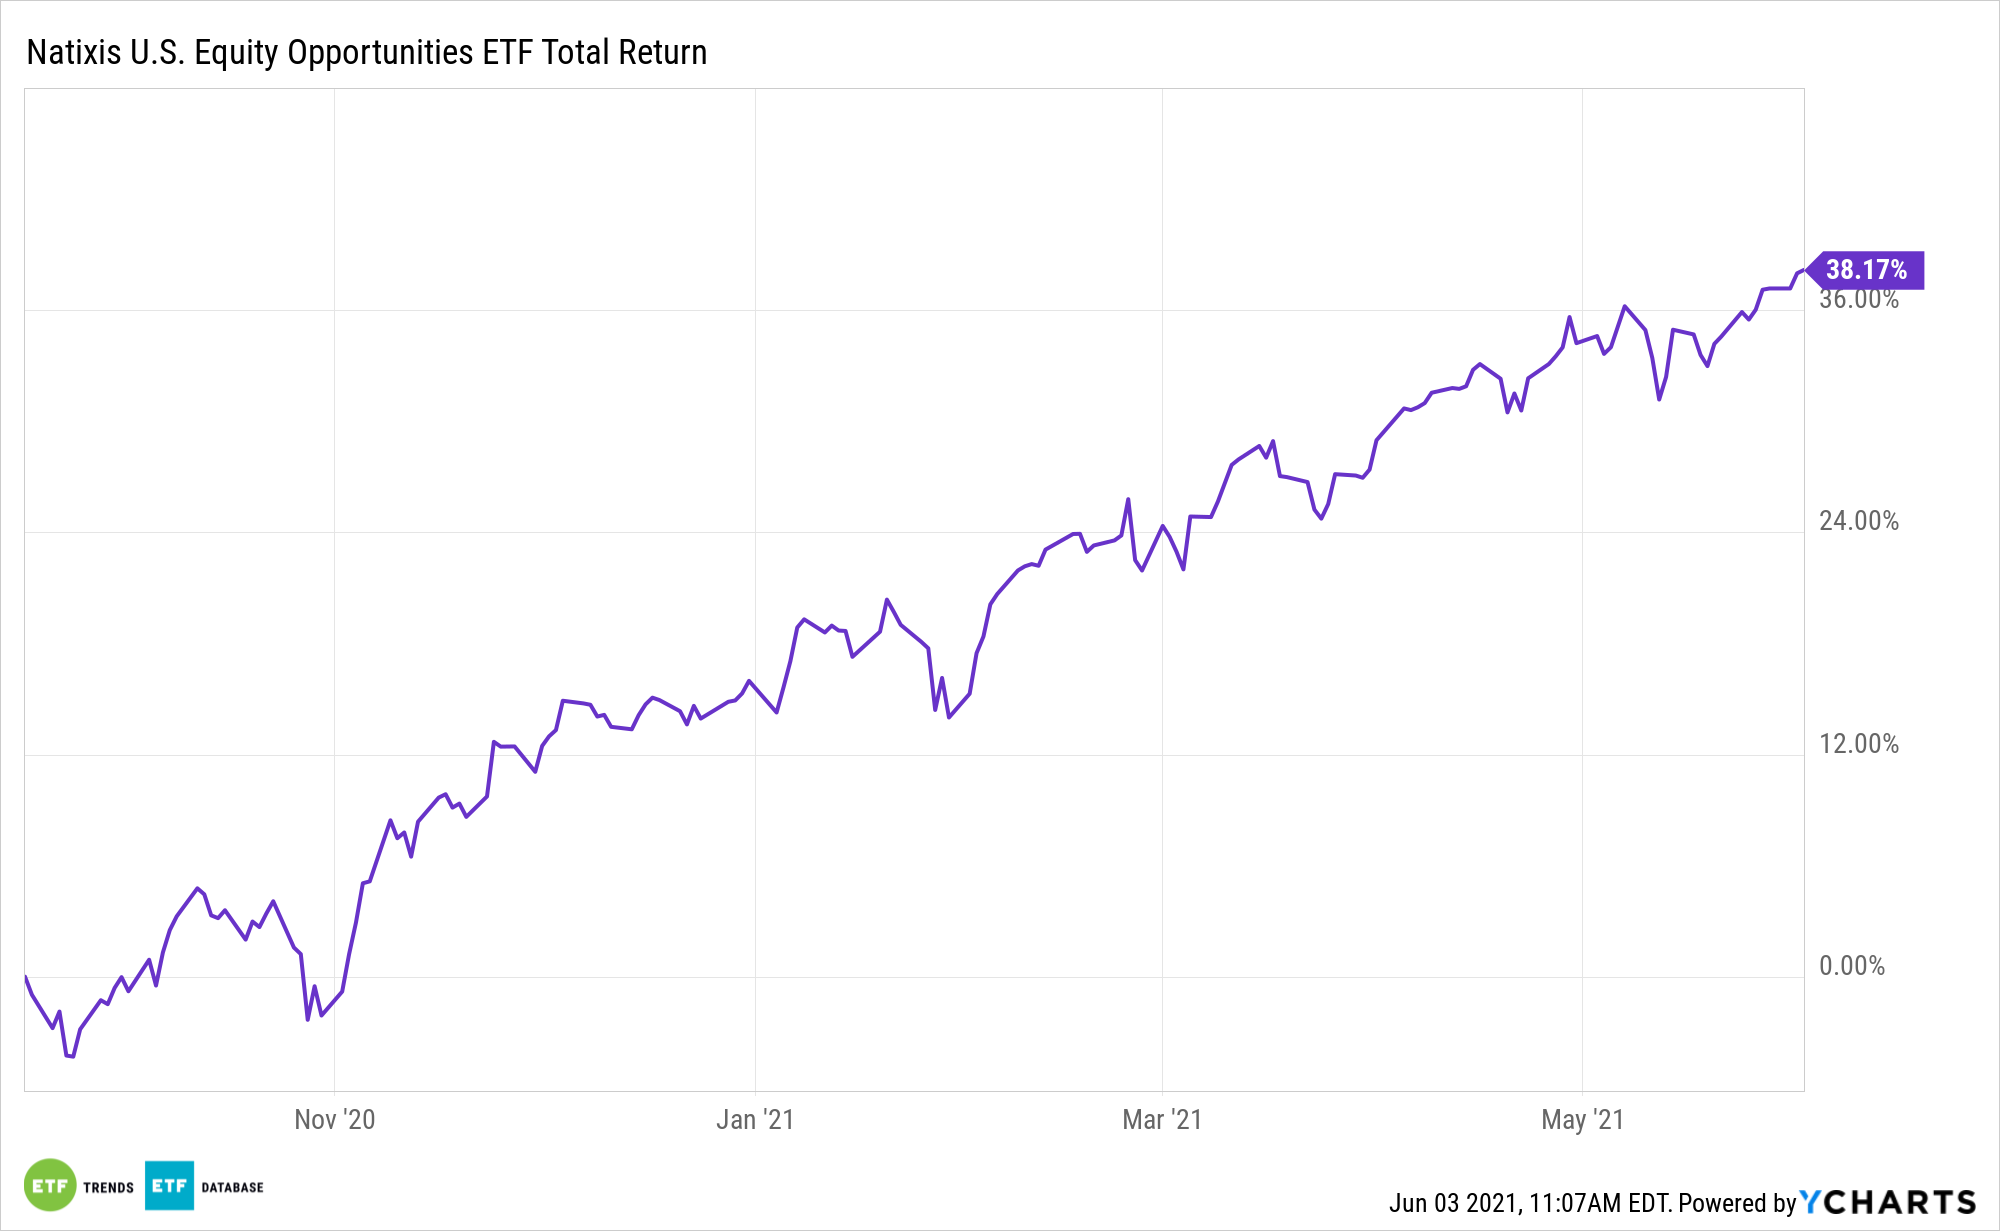 EQOP 1 Year Performance